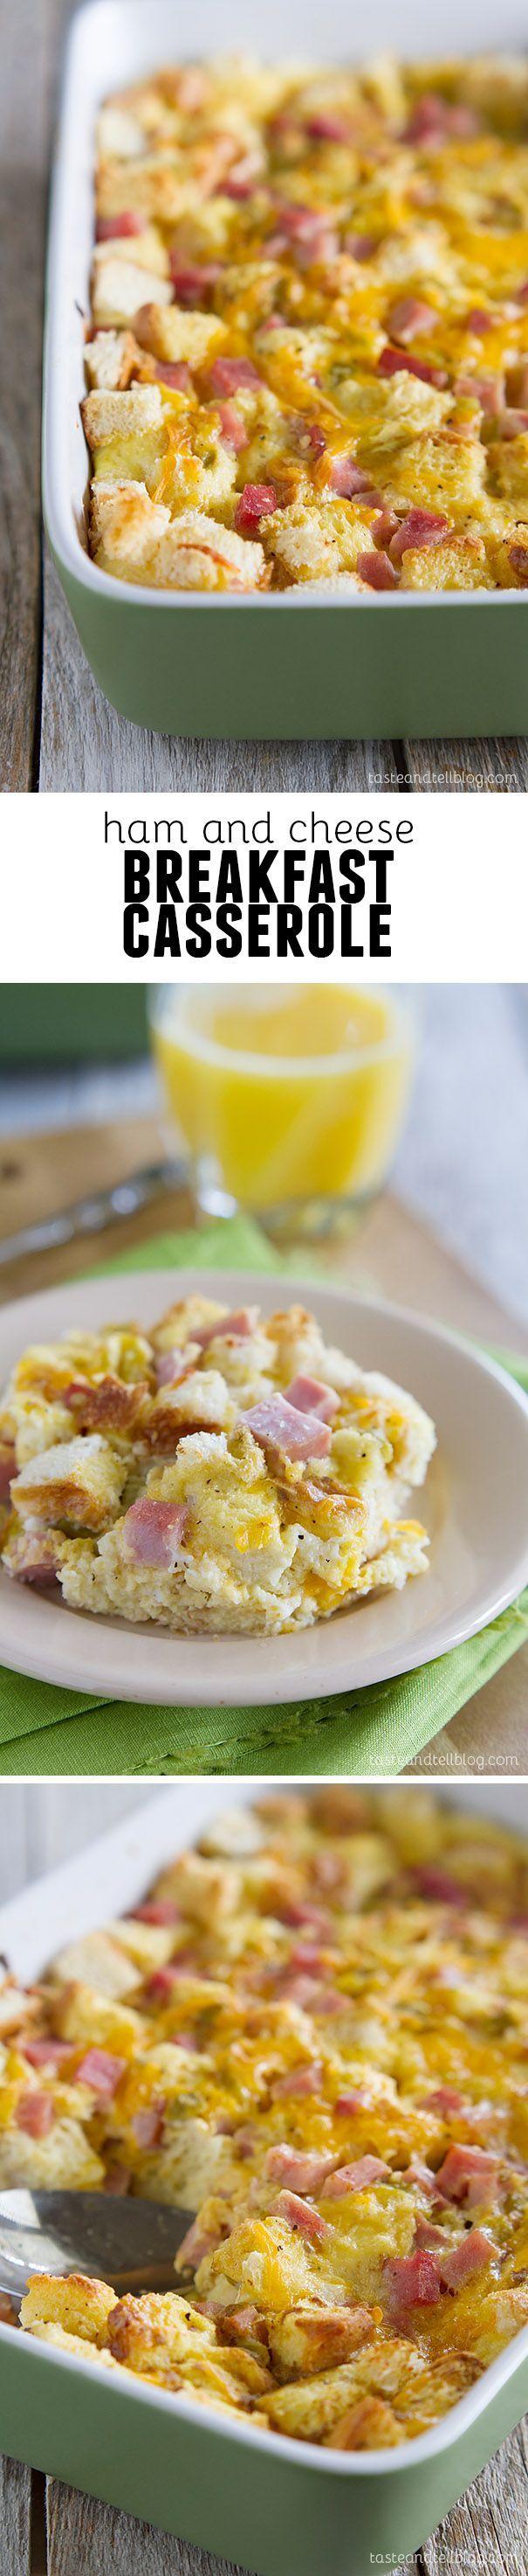 Ham and Cheese Breakfast Casserole - an easy make ahead breakfast recipe!